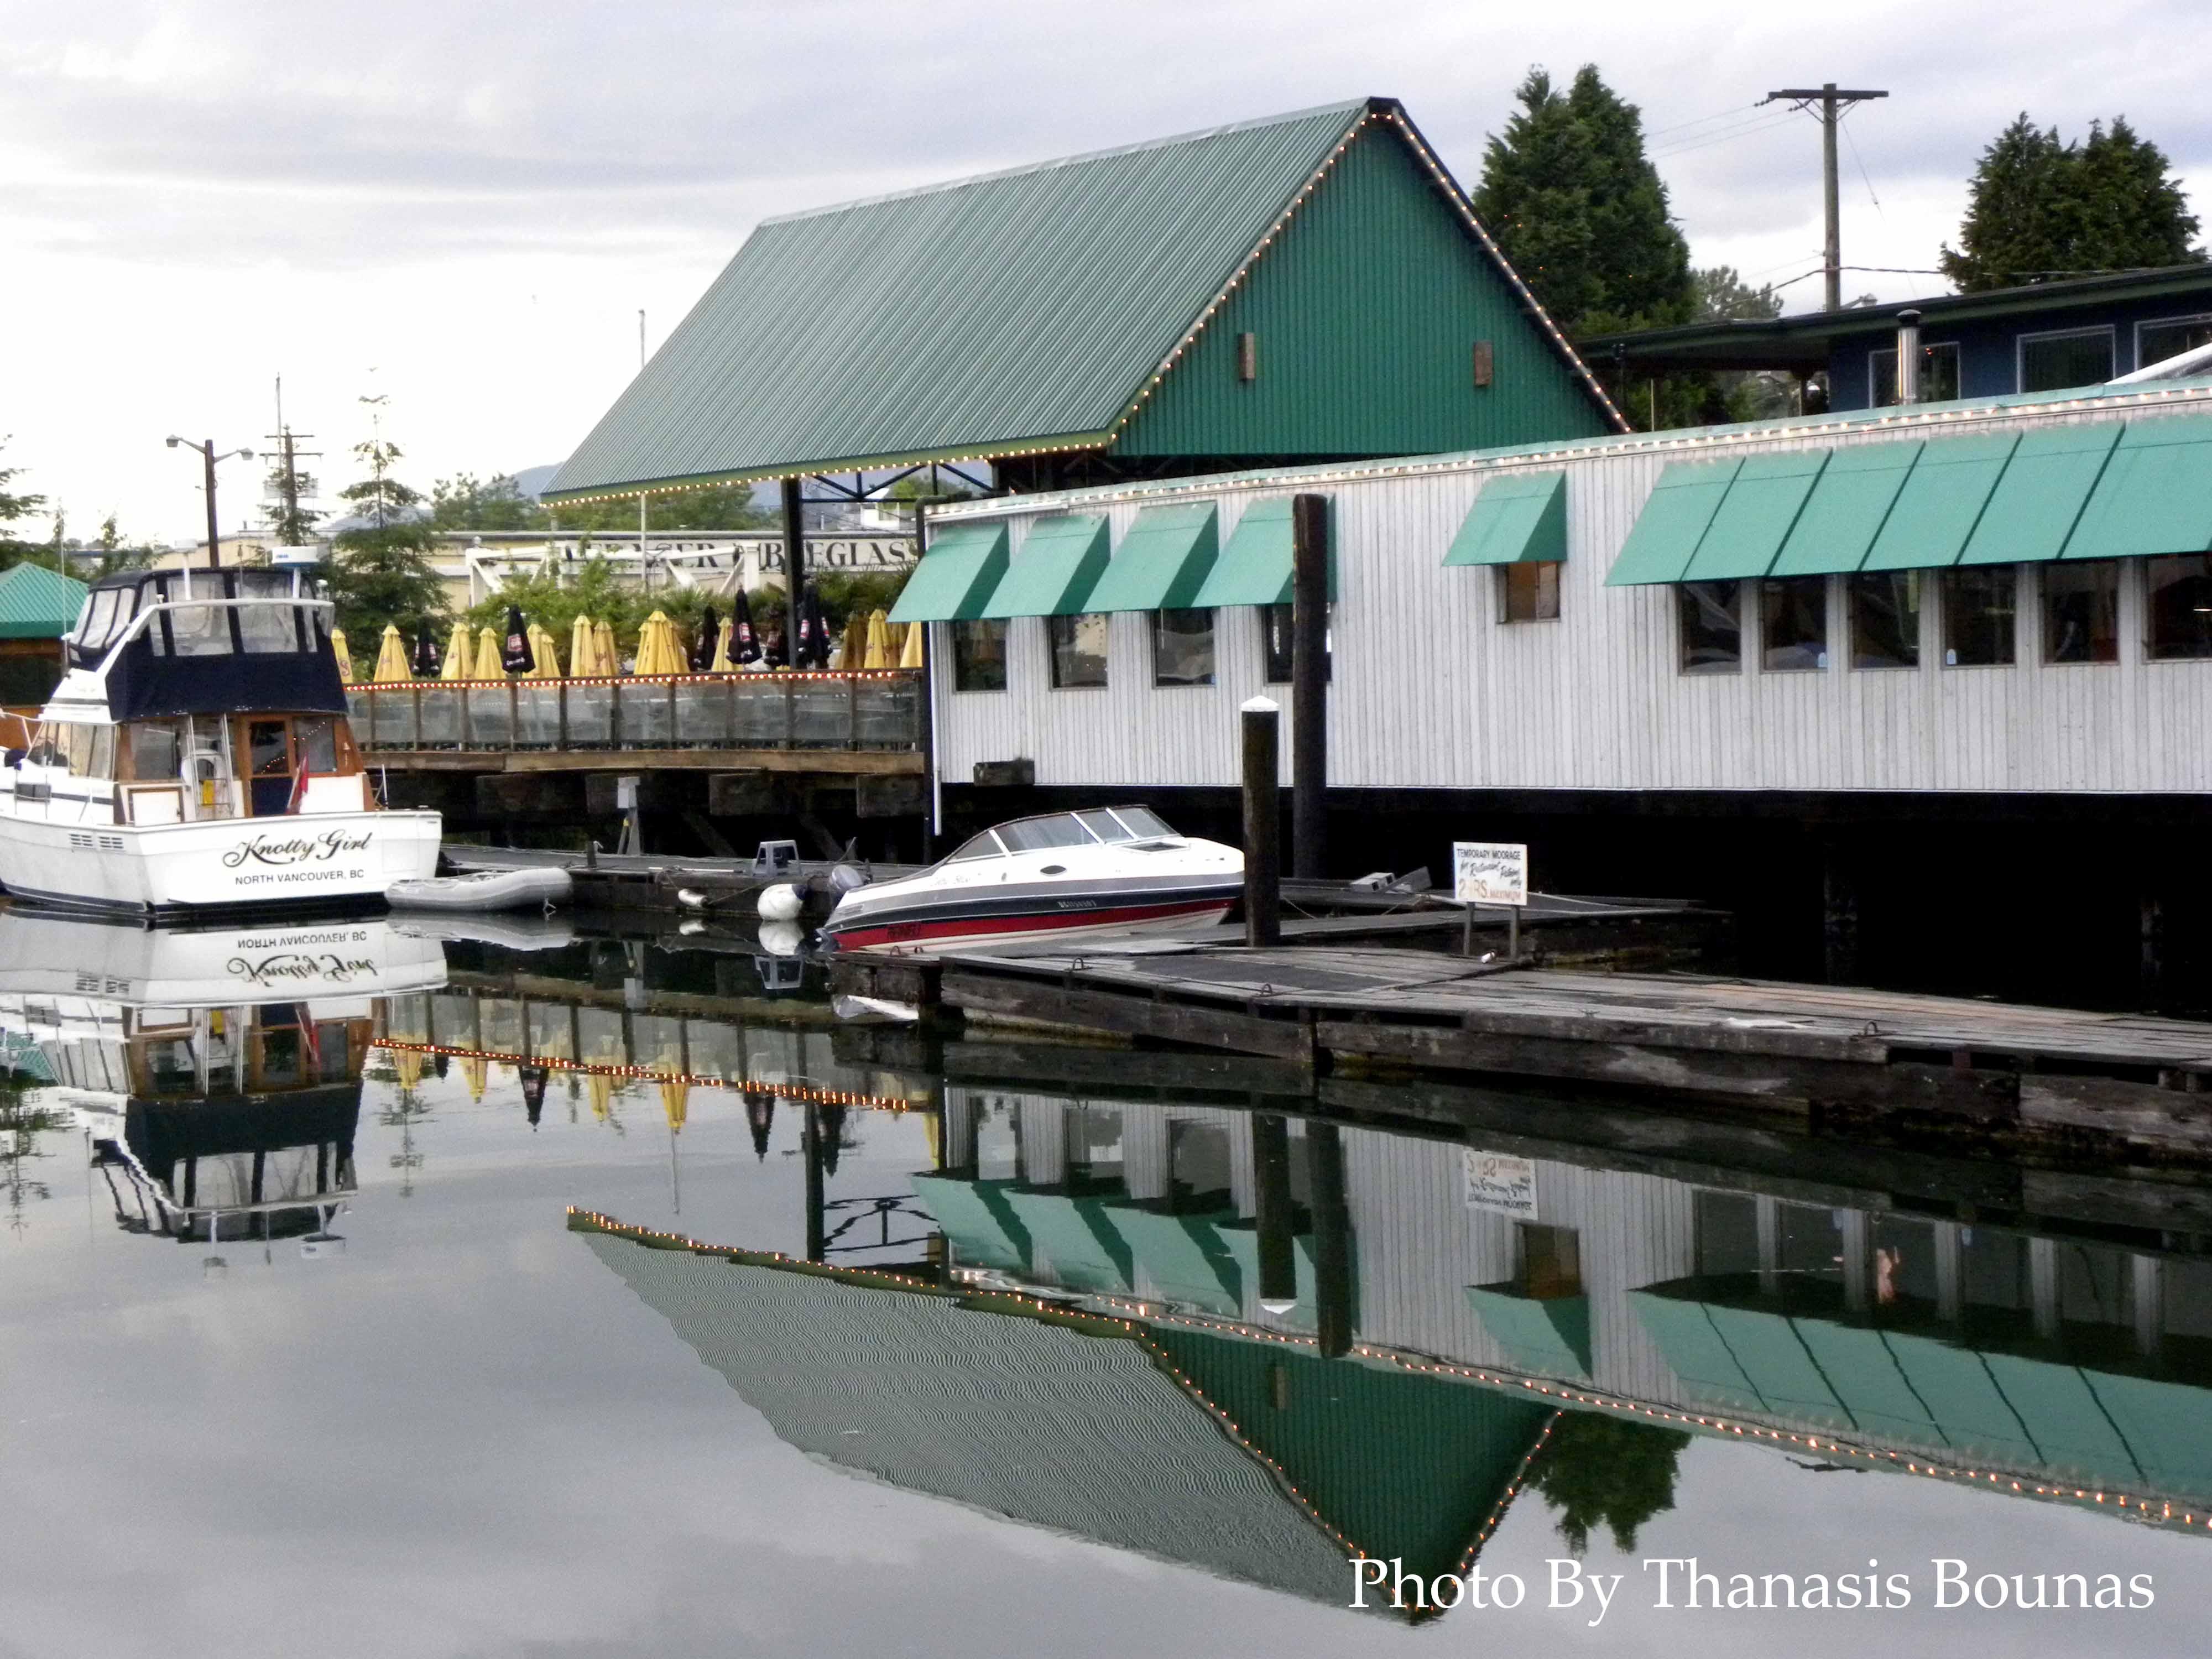 9 North Vancouver Beautiful British Columbia Photo By Thanasis Bounas